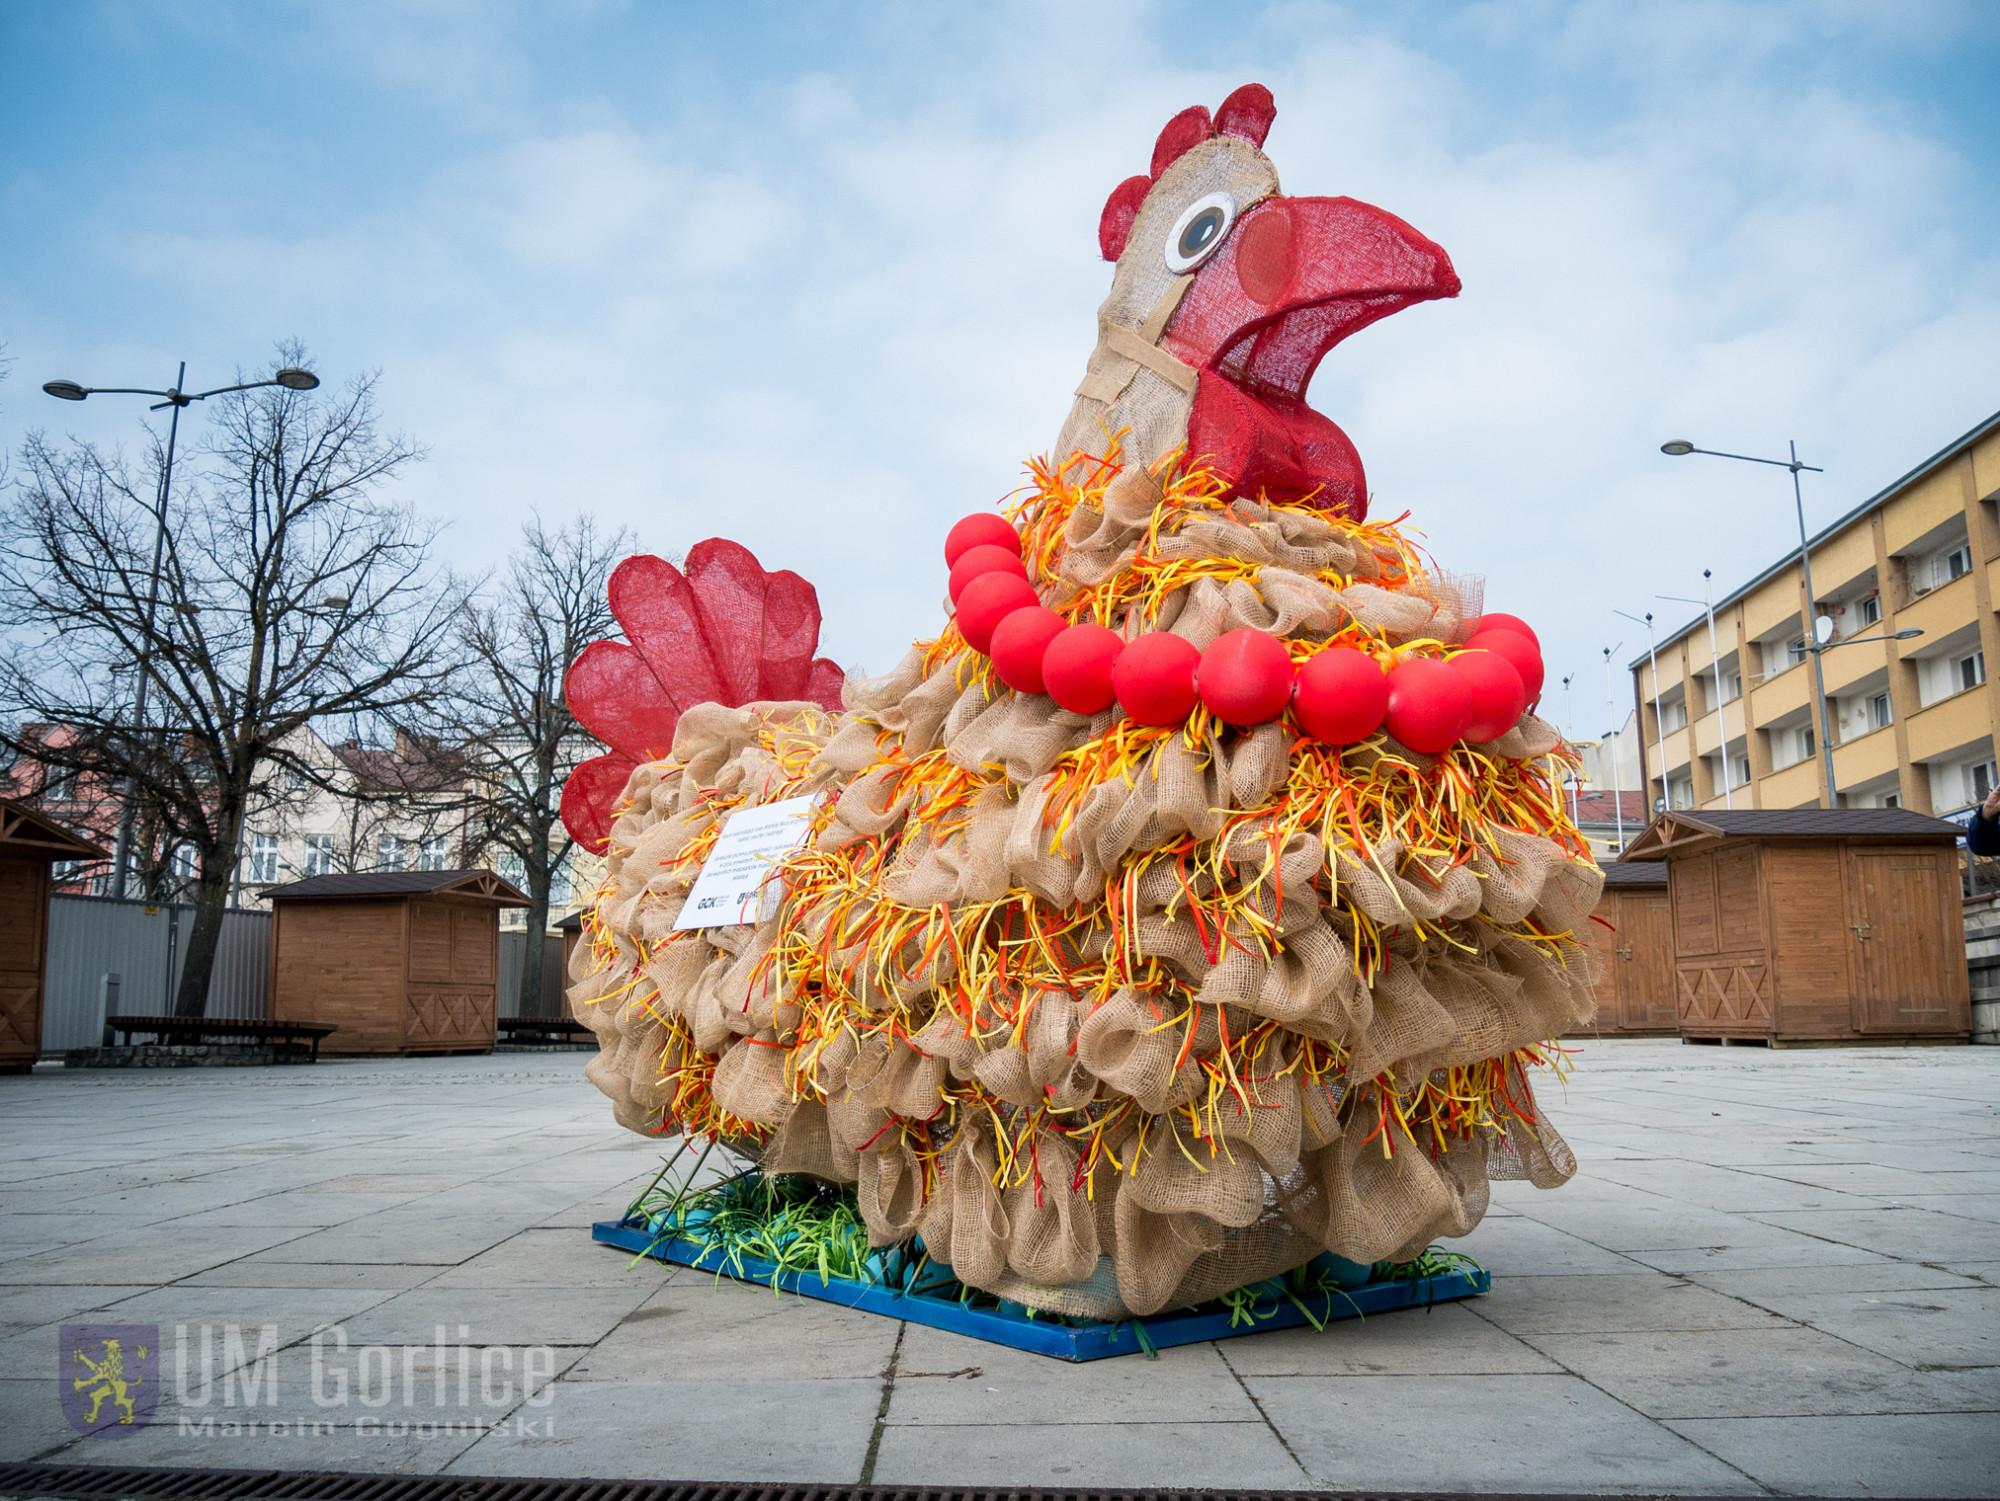 Wielkanocna kurka stanęła nagorlickim Rynku!